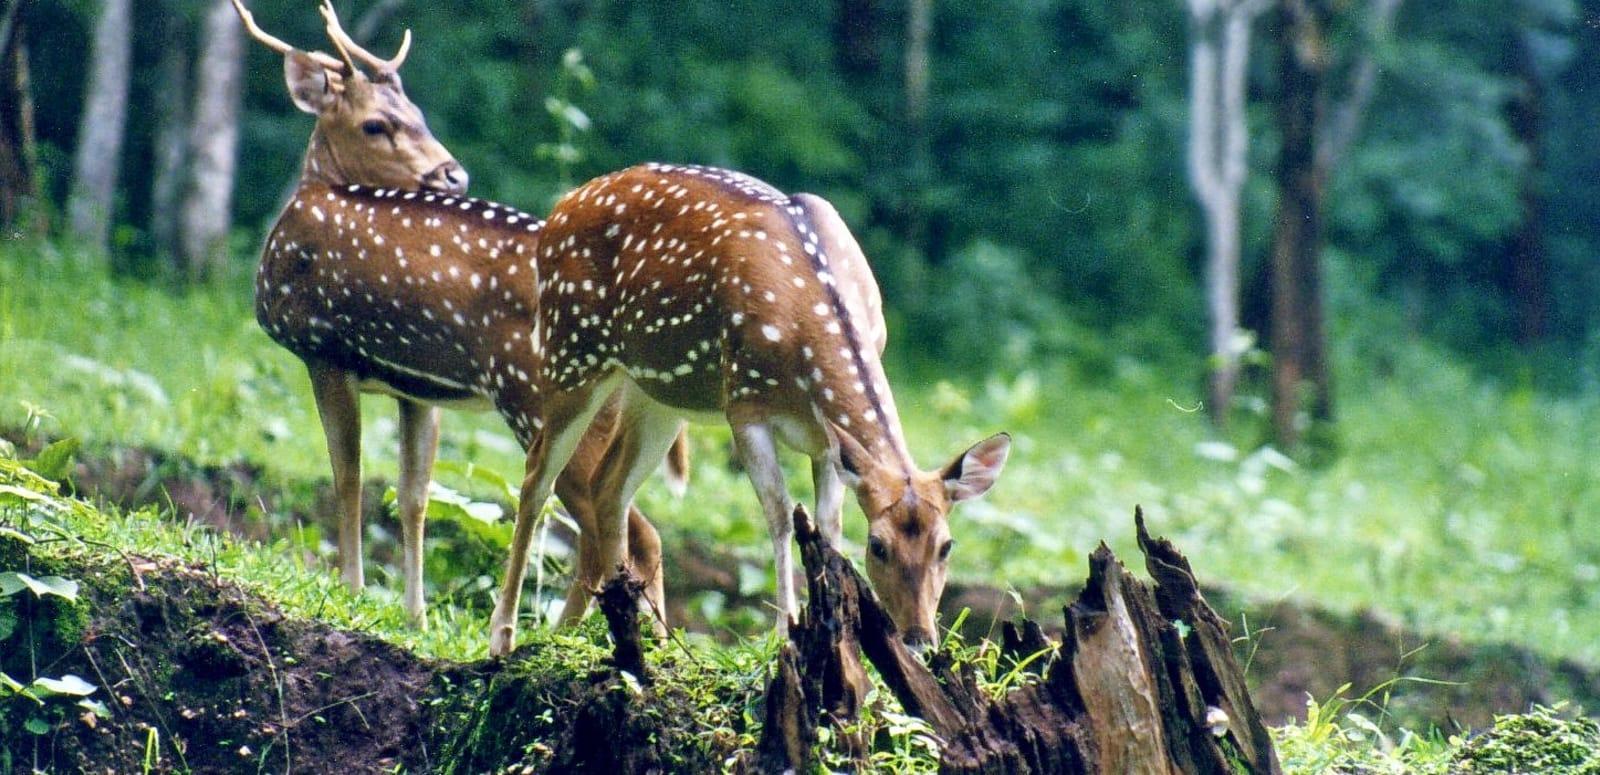 7 Best Wildlife Sanctuaries in GOA - 2019 (Photos & Reviews)